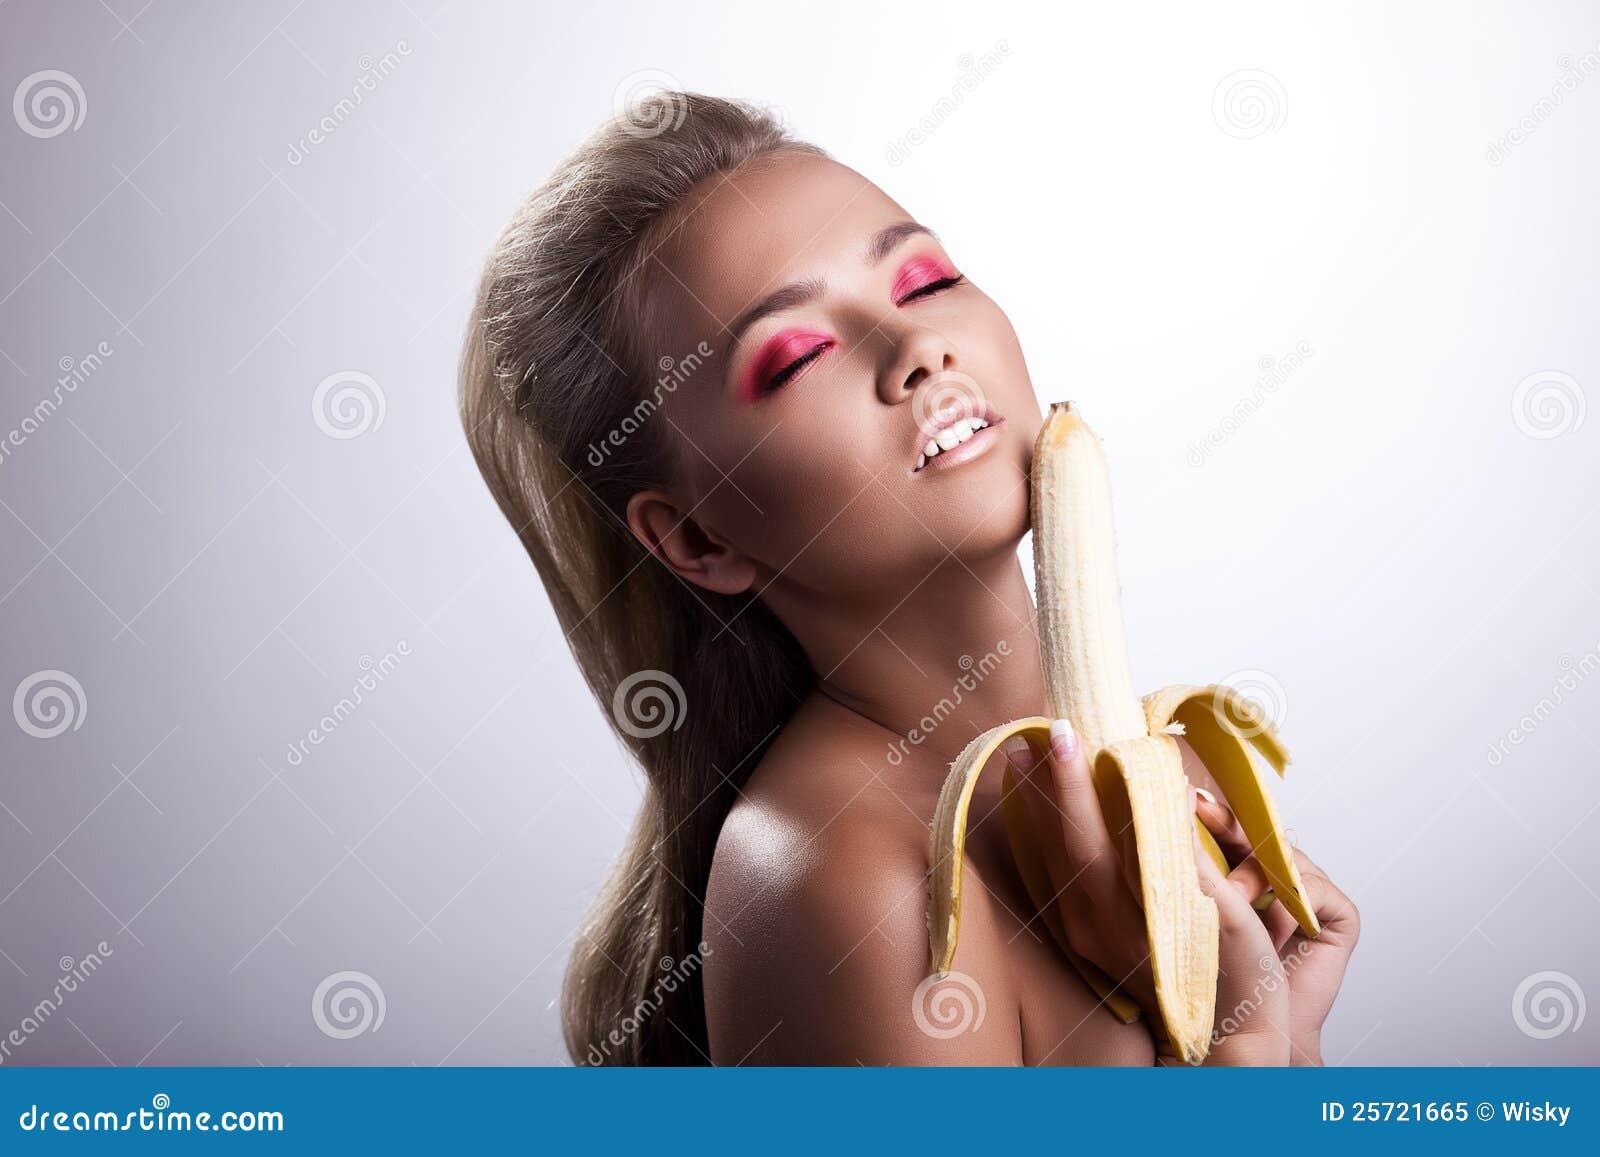 Как девушки эротично едят бананы картинки — photo 12